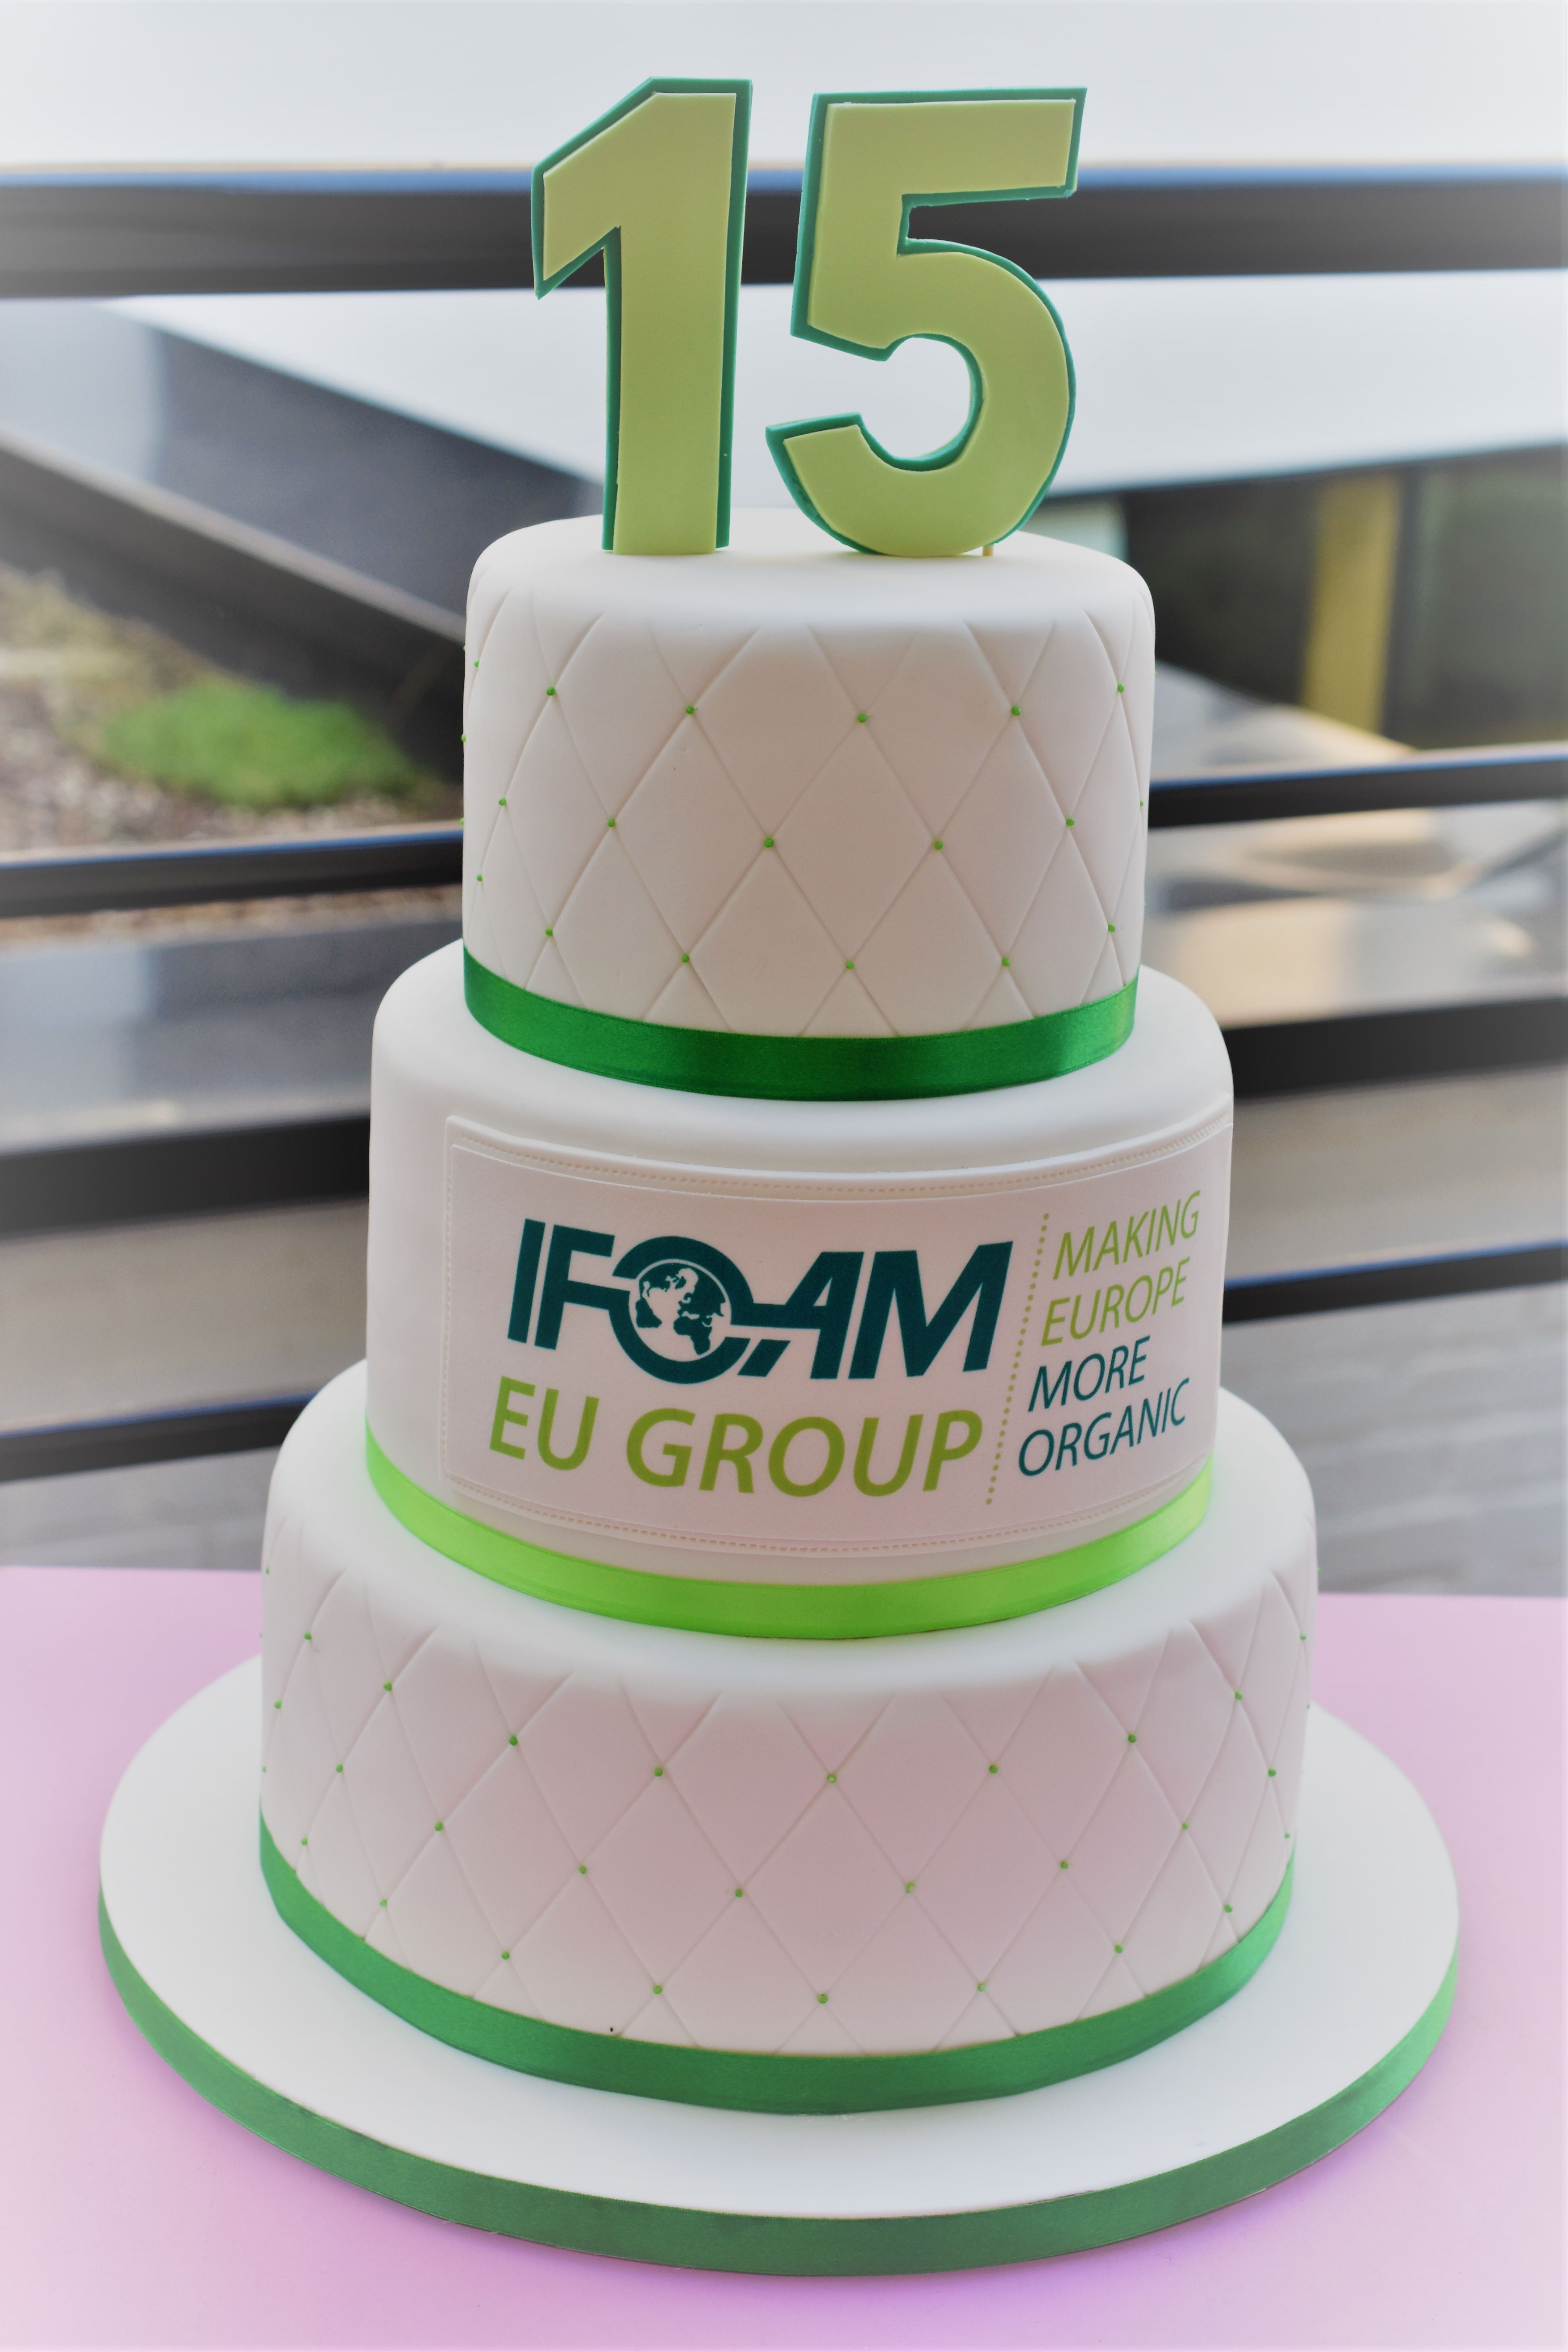 Ifoam Corporate Cake In 2018 Cakes Pinterest Cake Creative